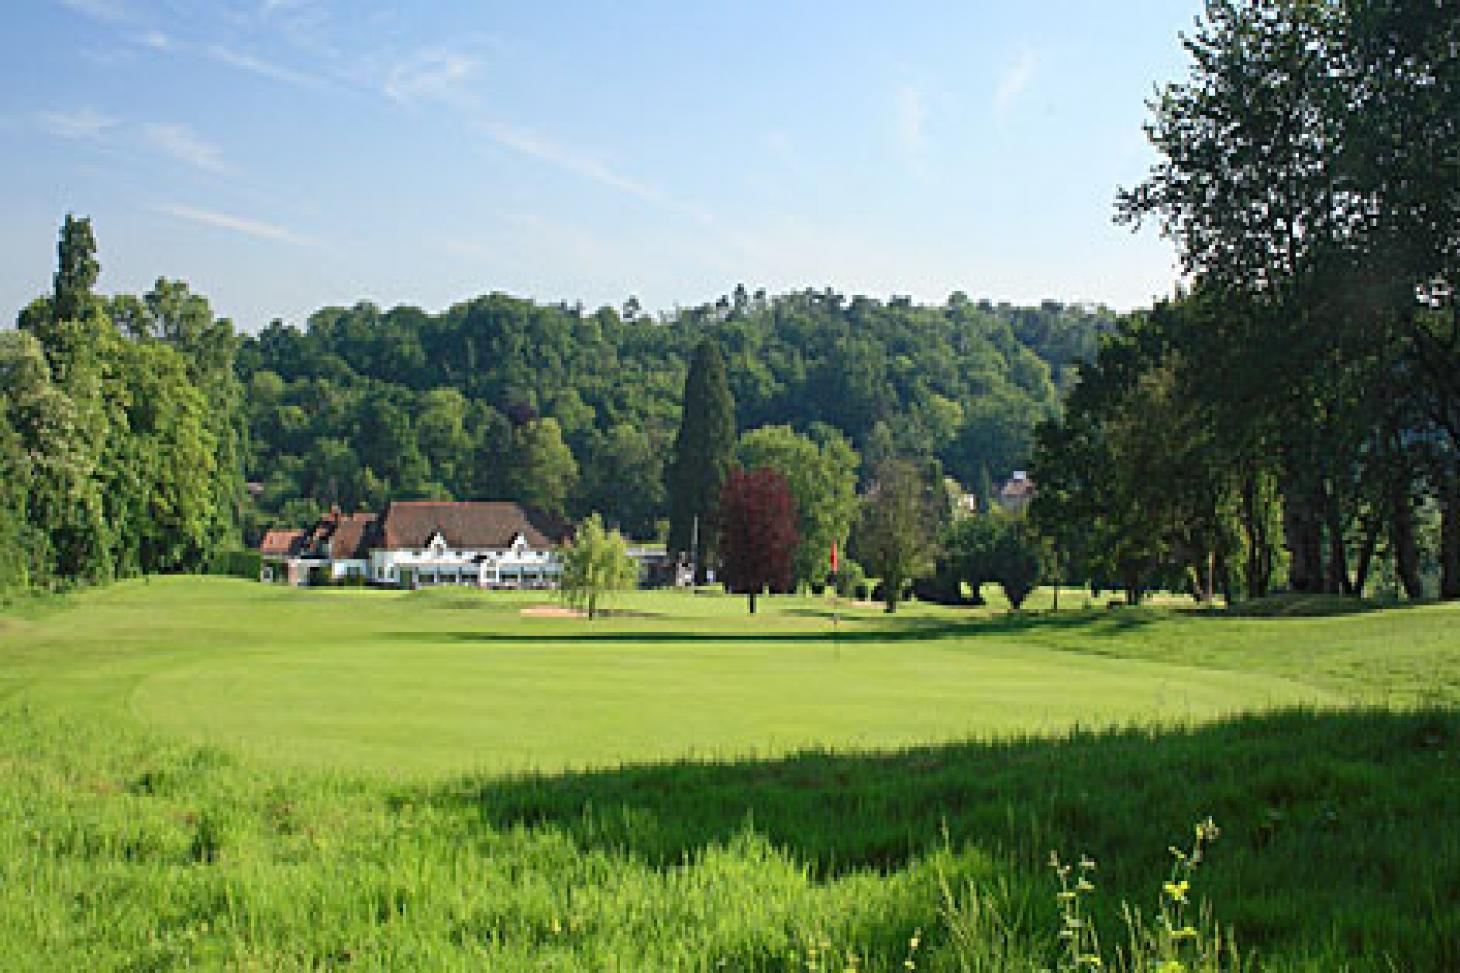 Croham Hurst Golf Club 18 hole golf course